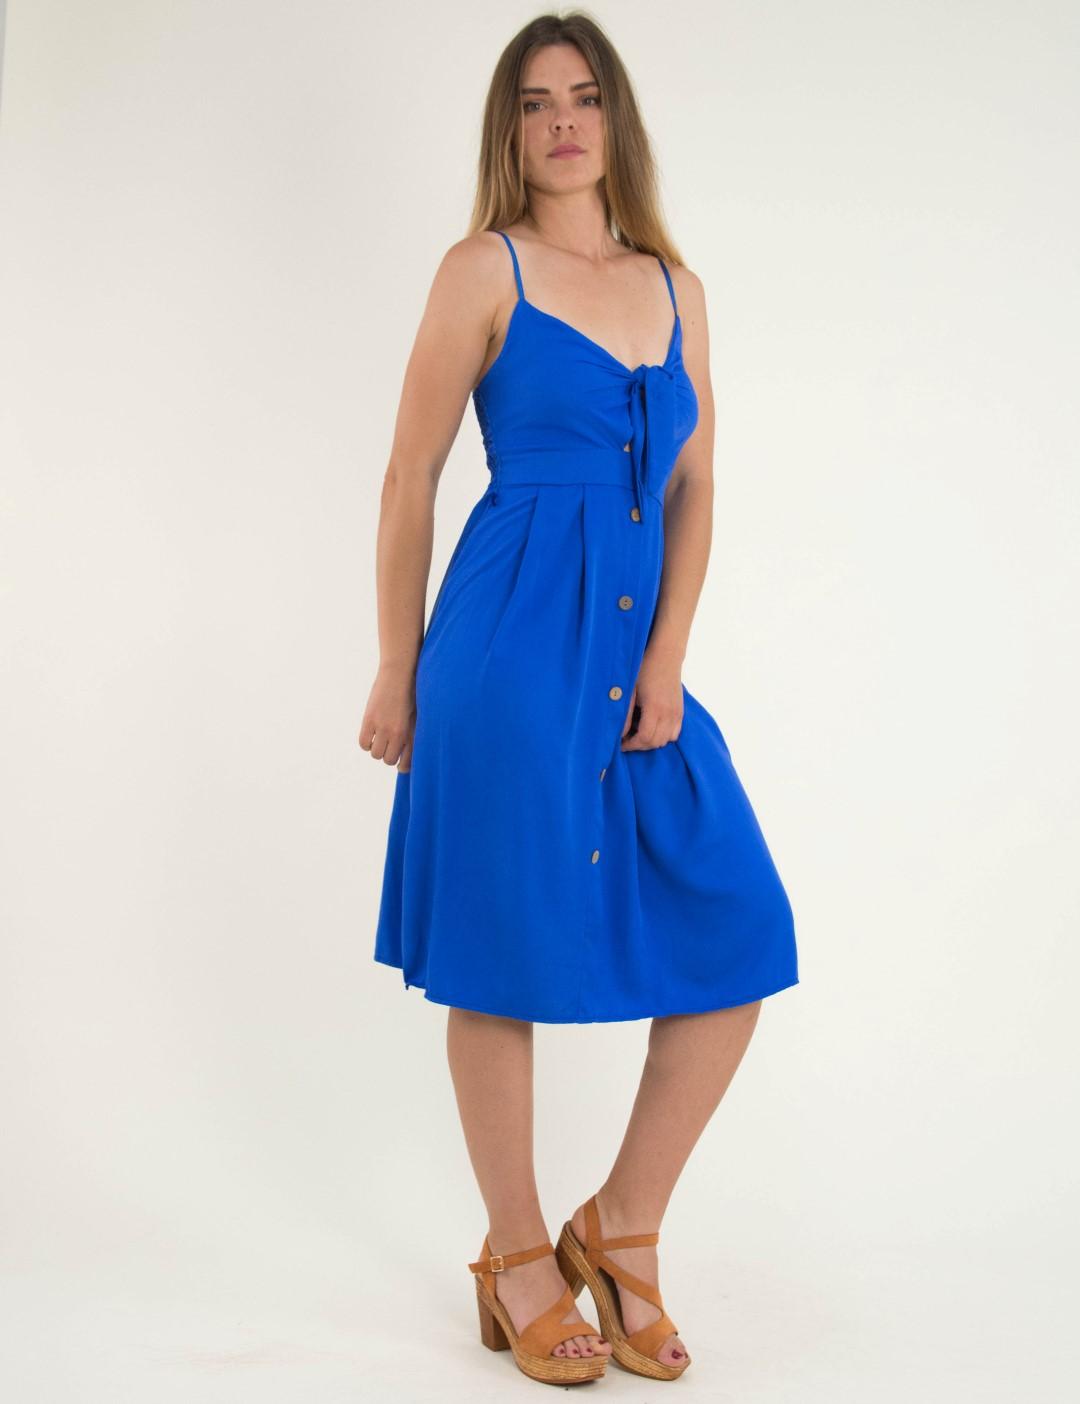 02acf44967e5 Γυναικείο μπλε · Γυναικείο ρουά midi φόρεμα ραντάκι κουμπιά 9103J